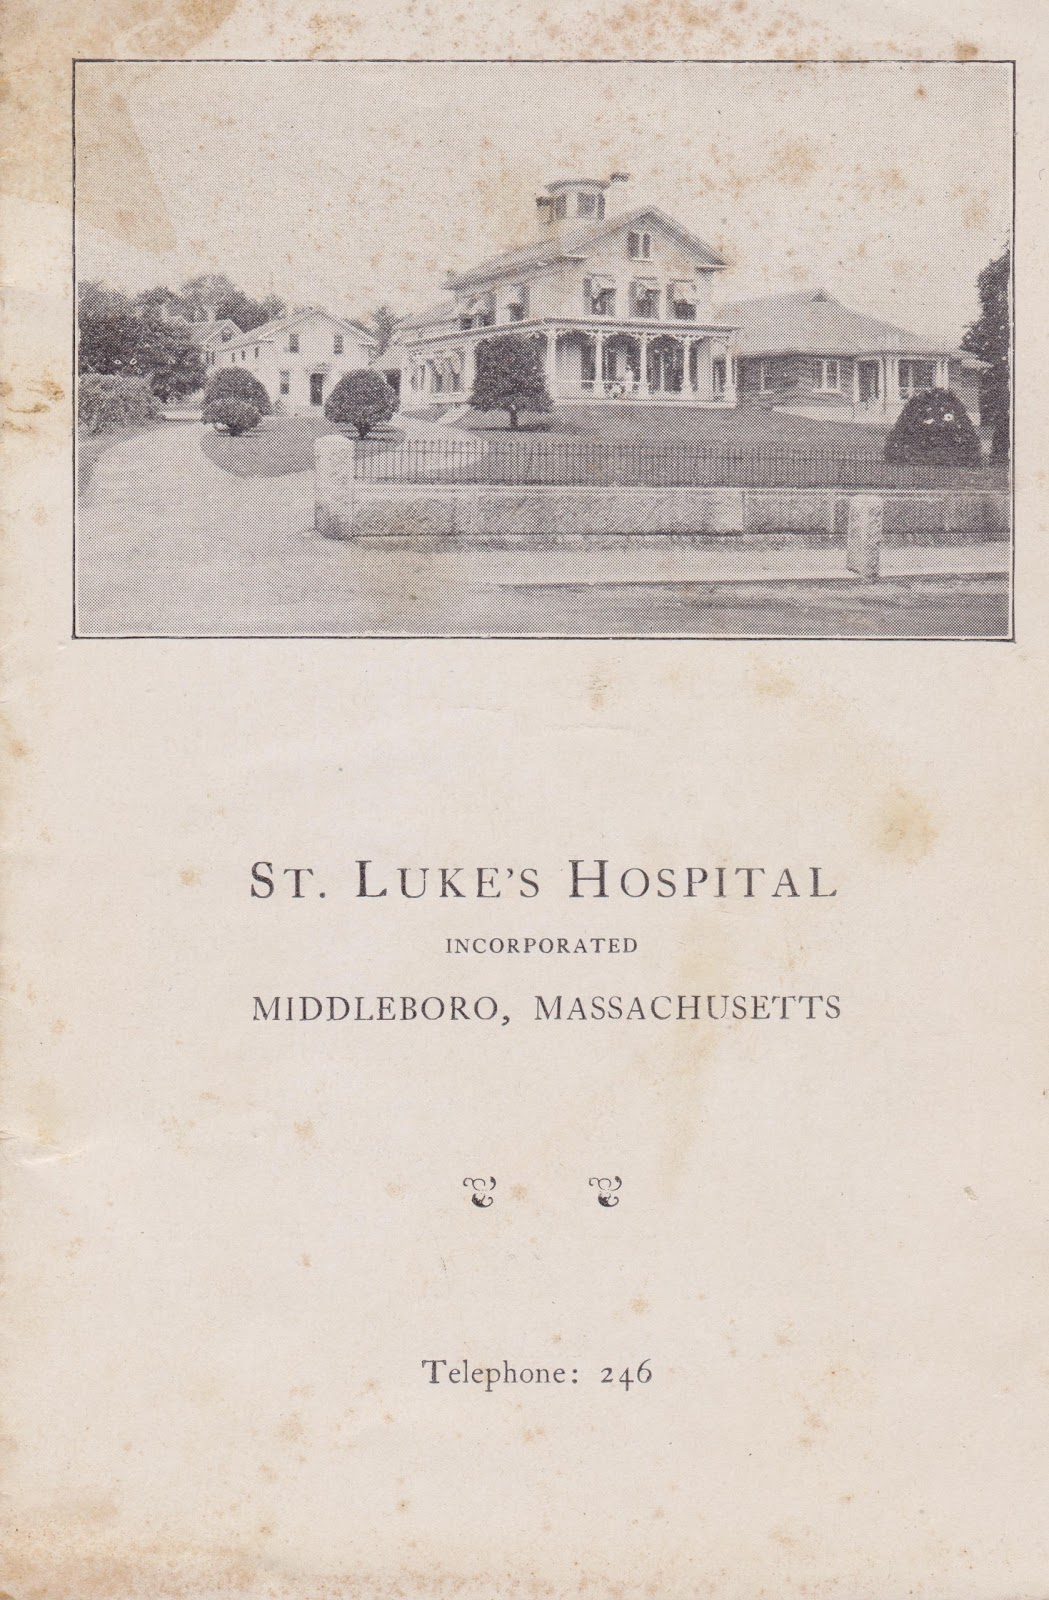 Recollecting Nemasket: St. Luke's Hospital, 1932